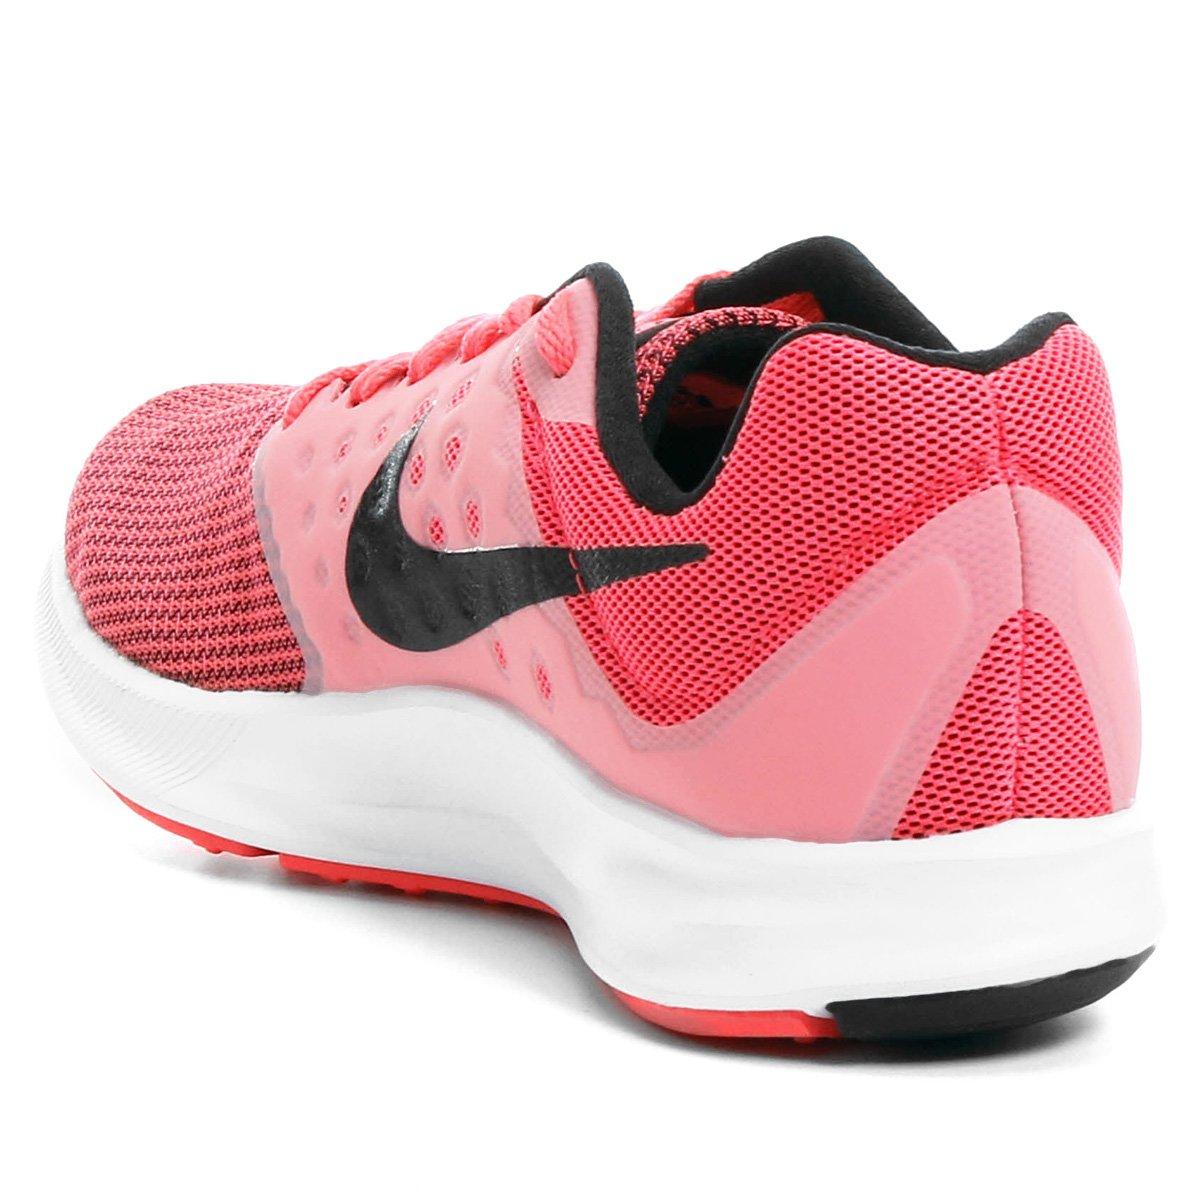 Tênis 7 Nike Rosa Nike Preto Tênis e Feminino Downshifter fSf1r